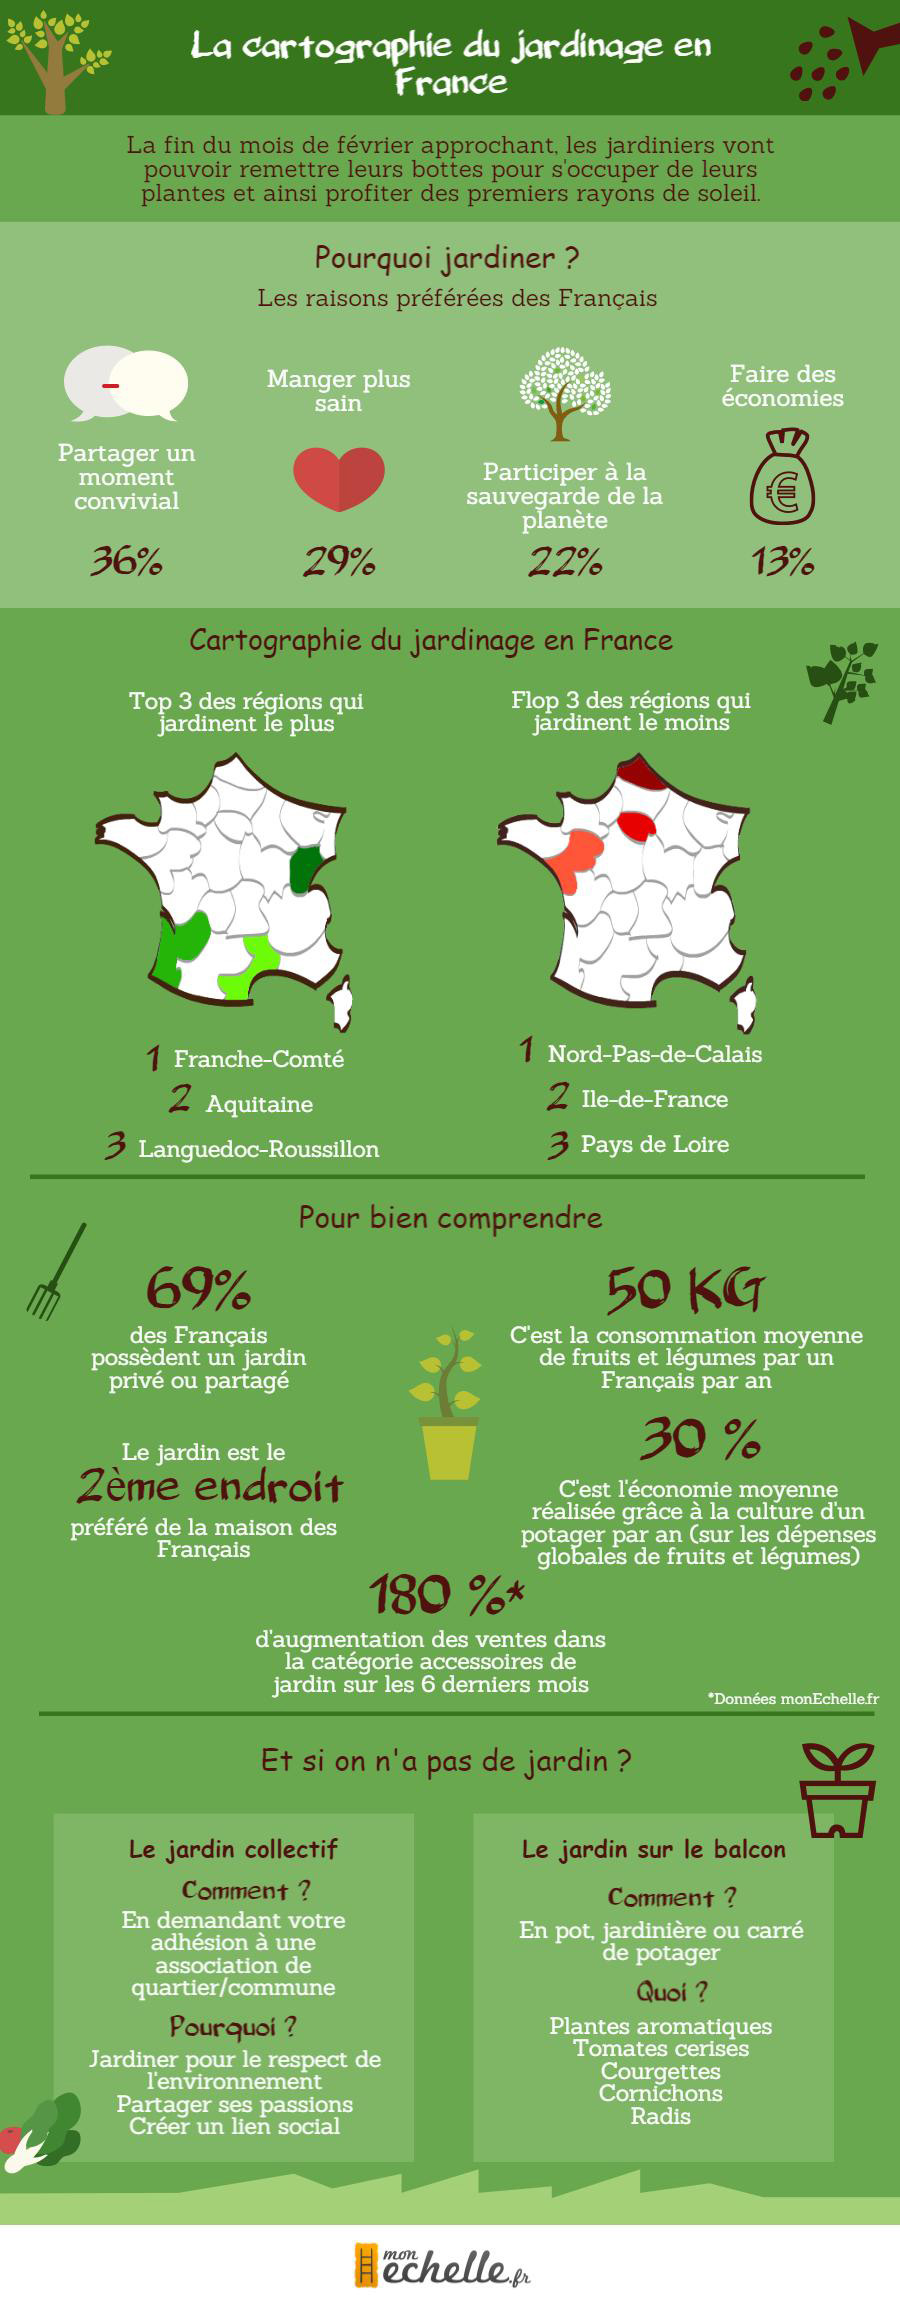 Infographie-Carte-Jardin-monEchelle.fr_